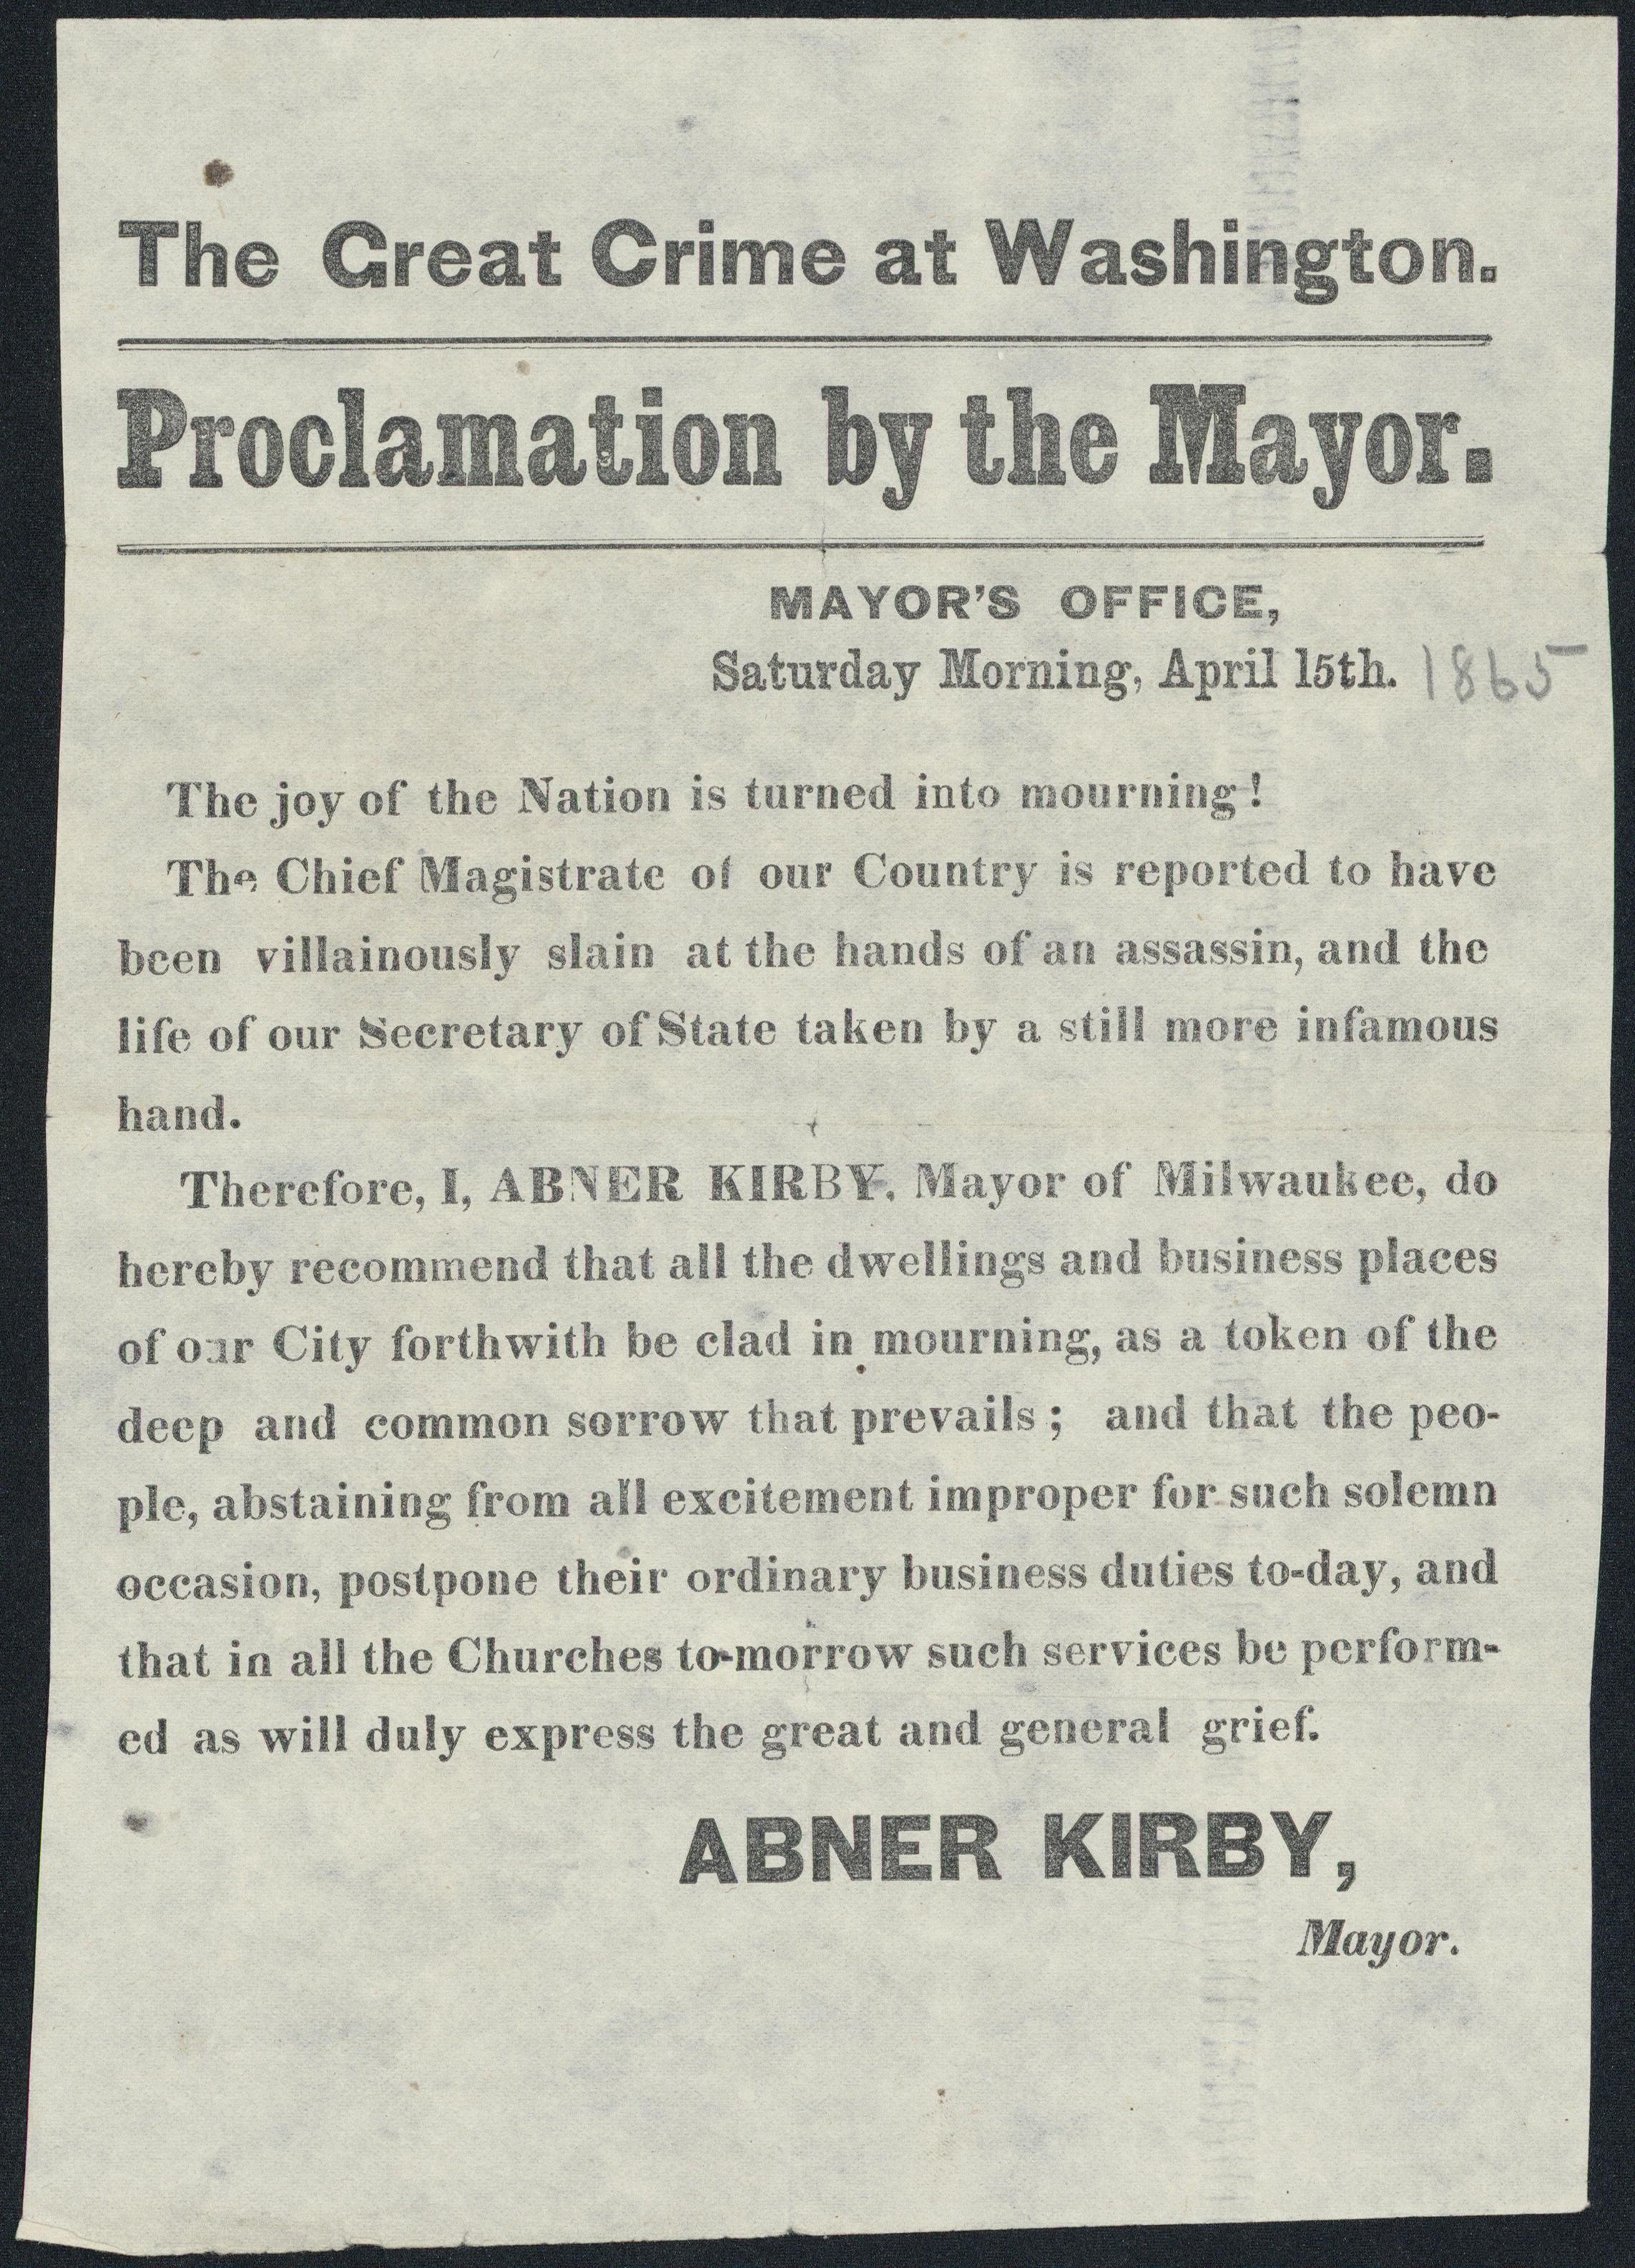 Proclamation by the Mayor of Milwaukee